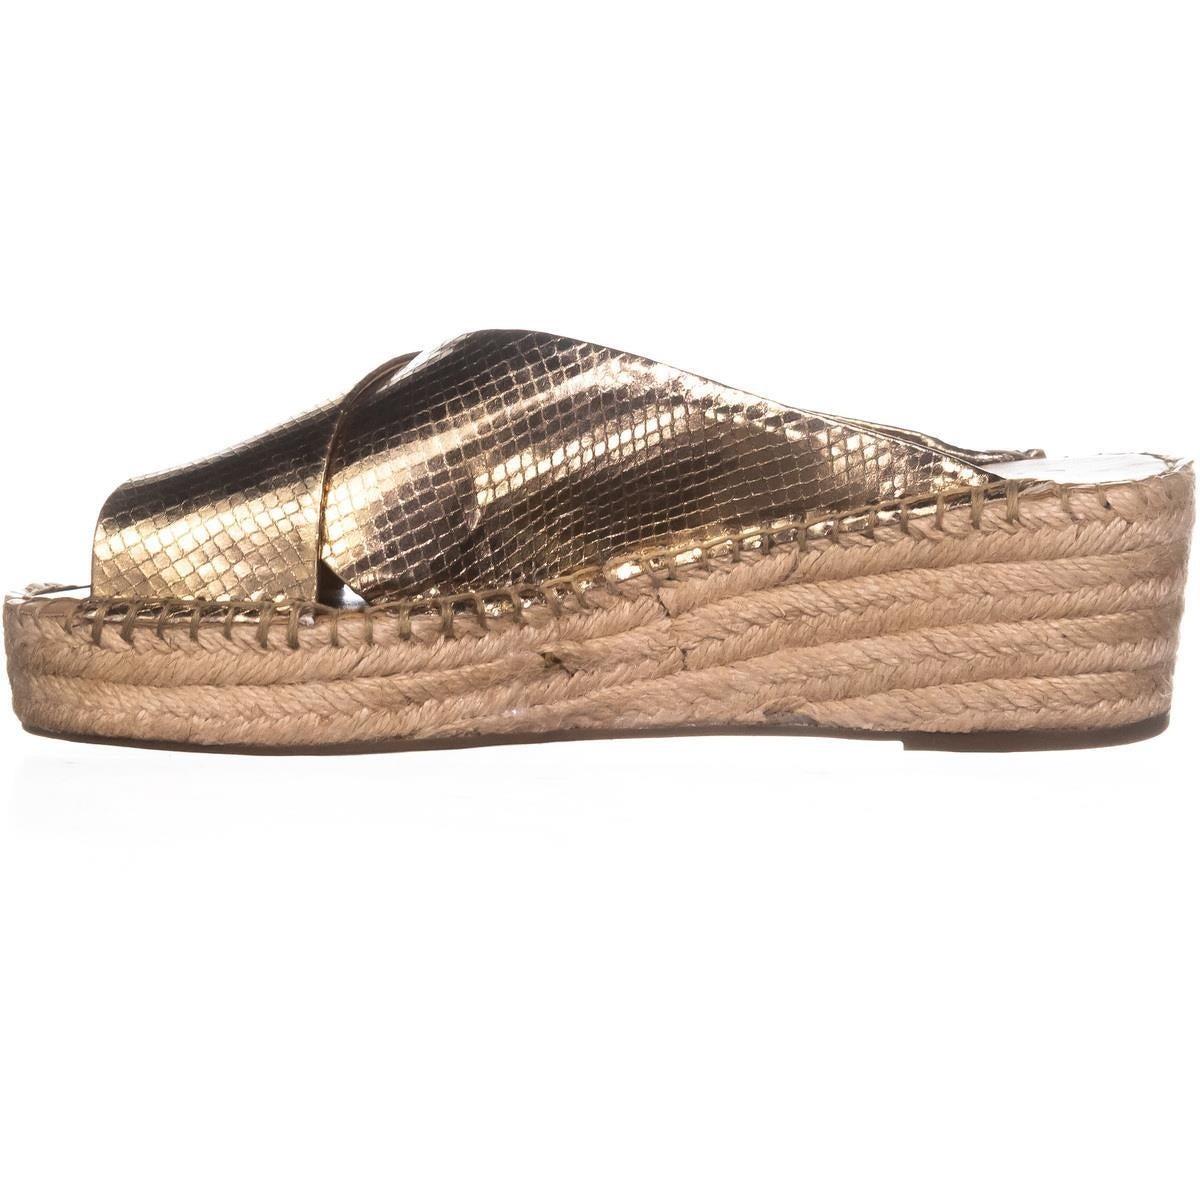 2b04ad63574 Franco Sarto Polina Espadrille Wedge Sandals, Gold - 9 w us